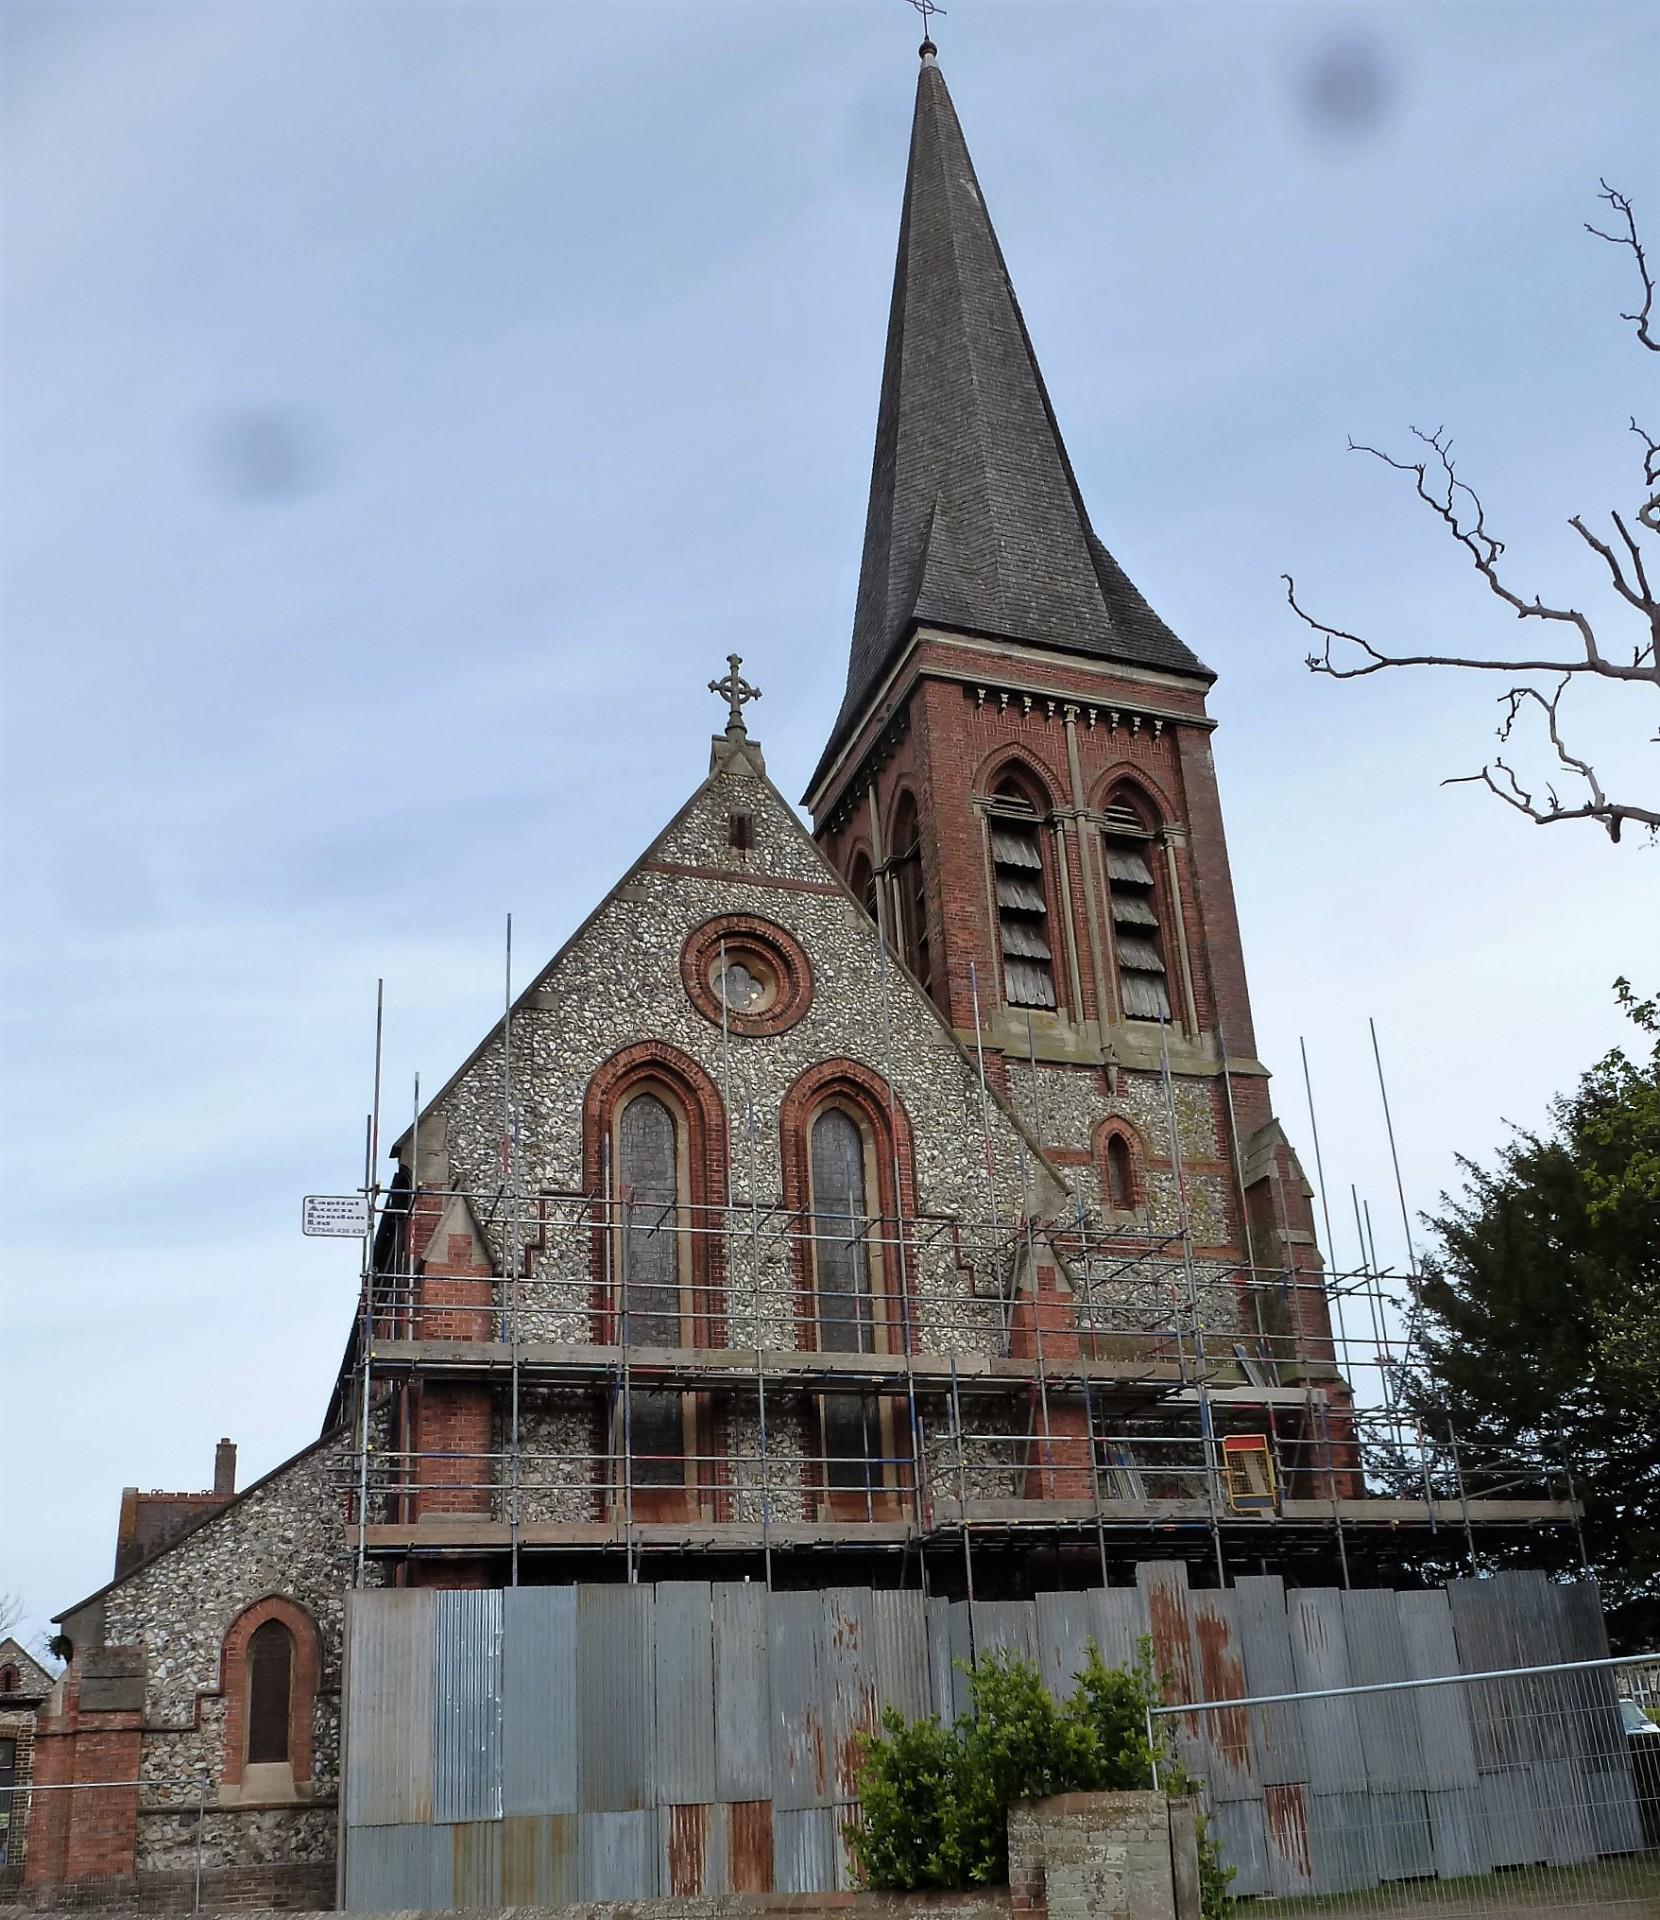 St. Botolph's, Heene, scaffolding, 29.4.16